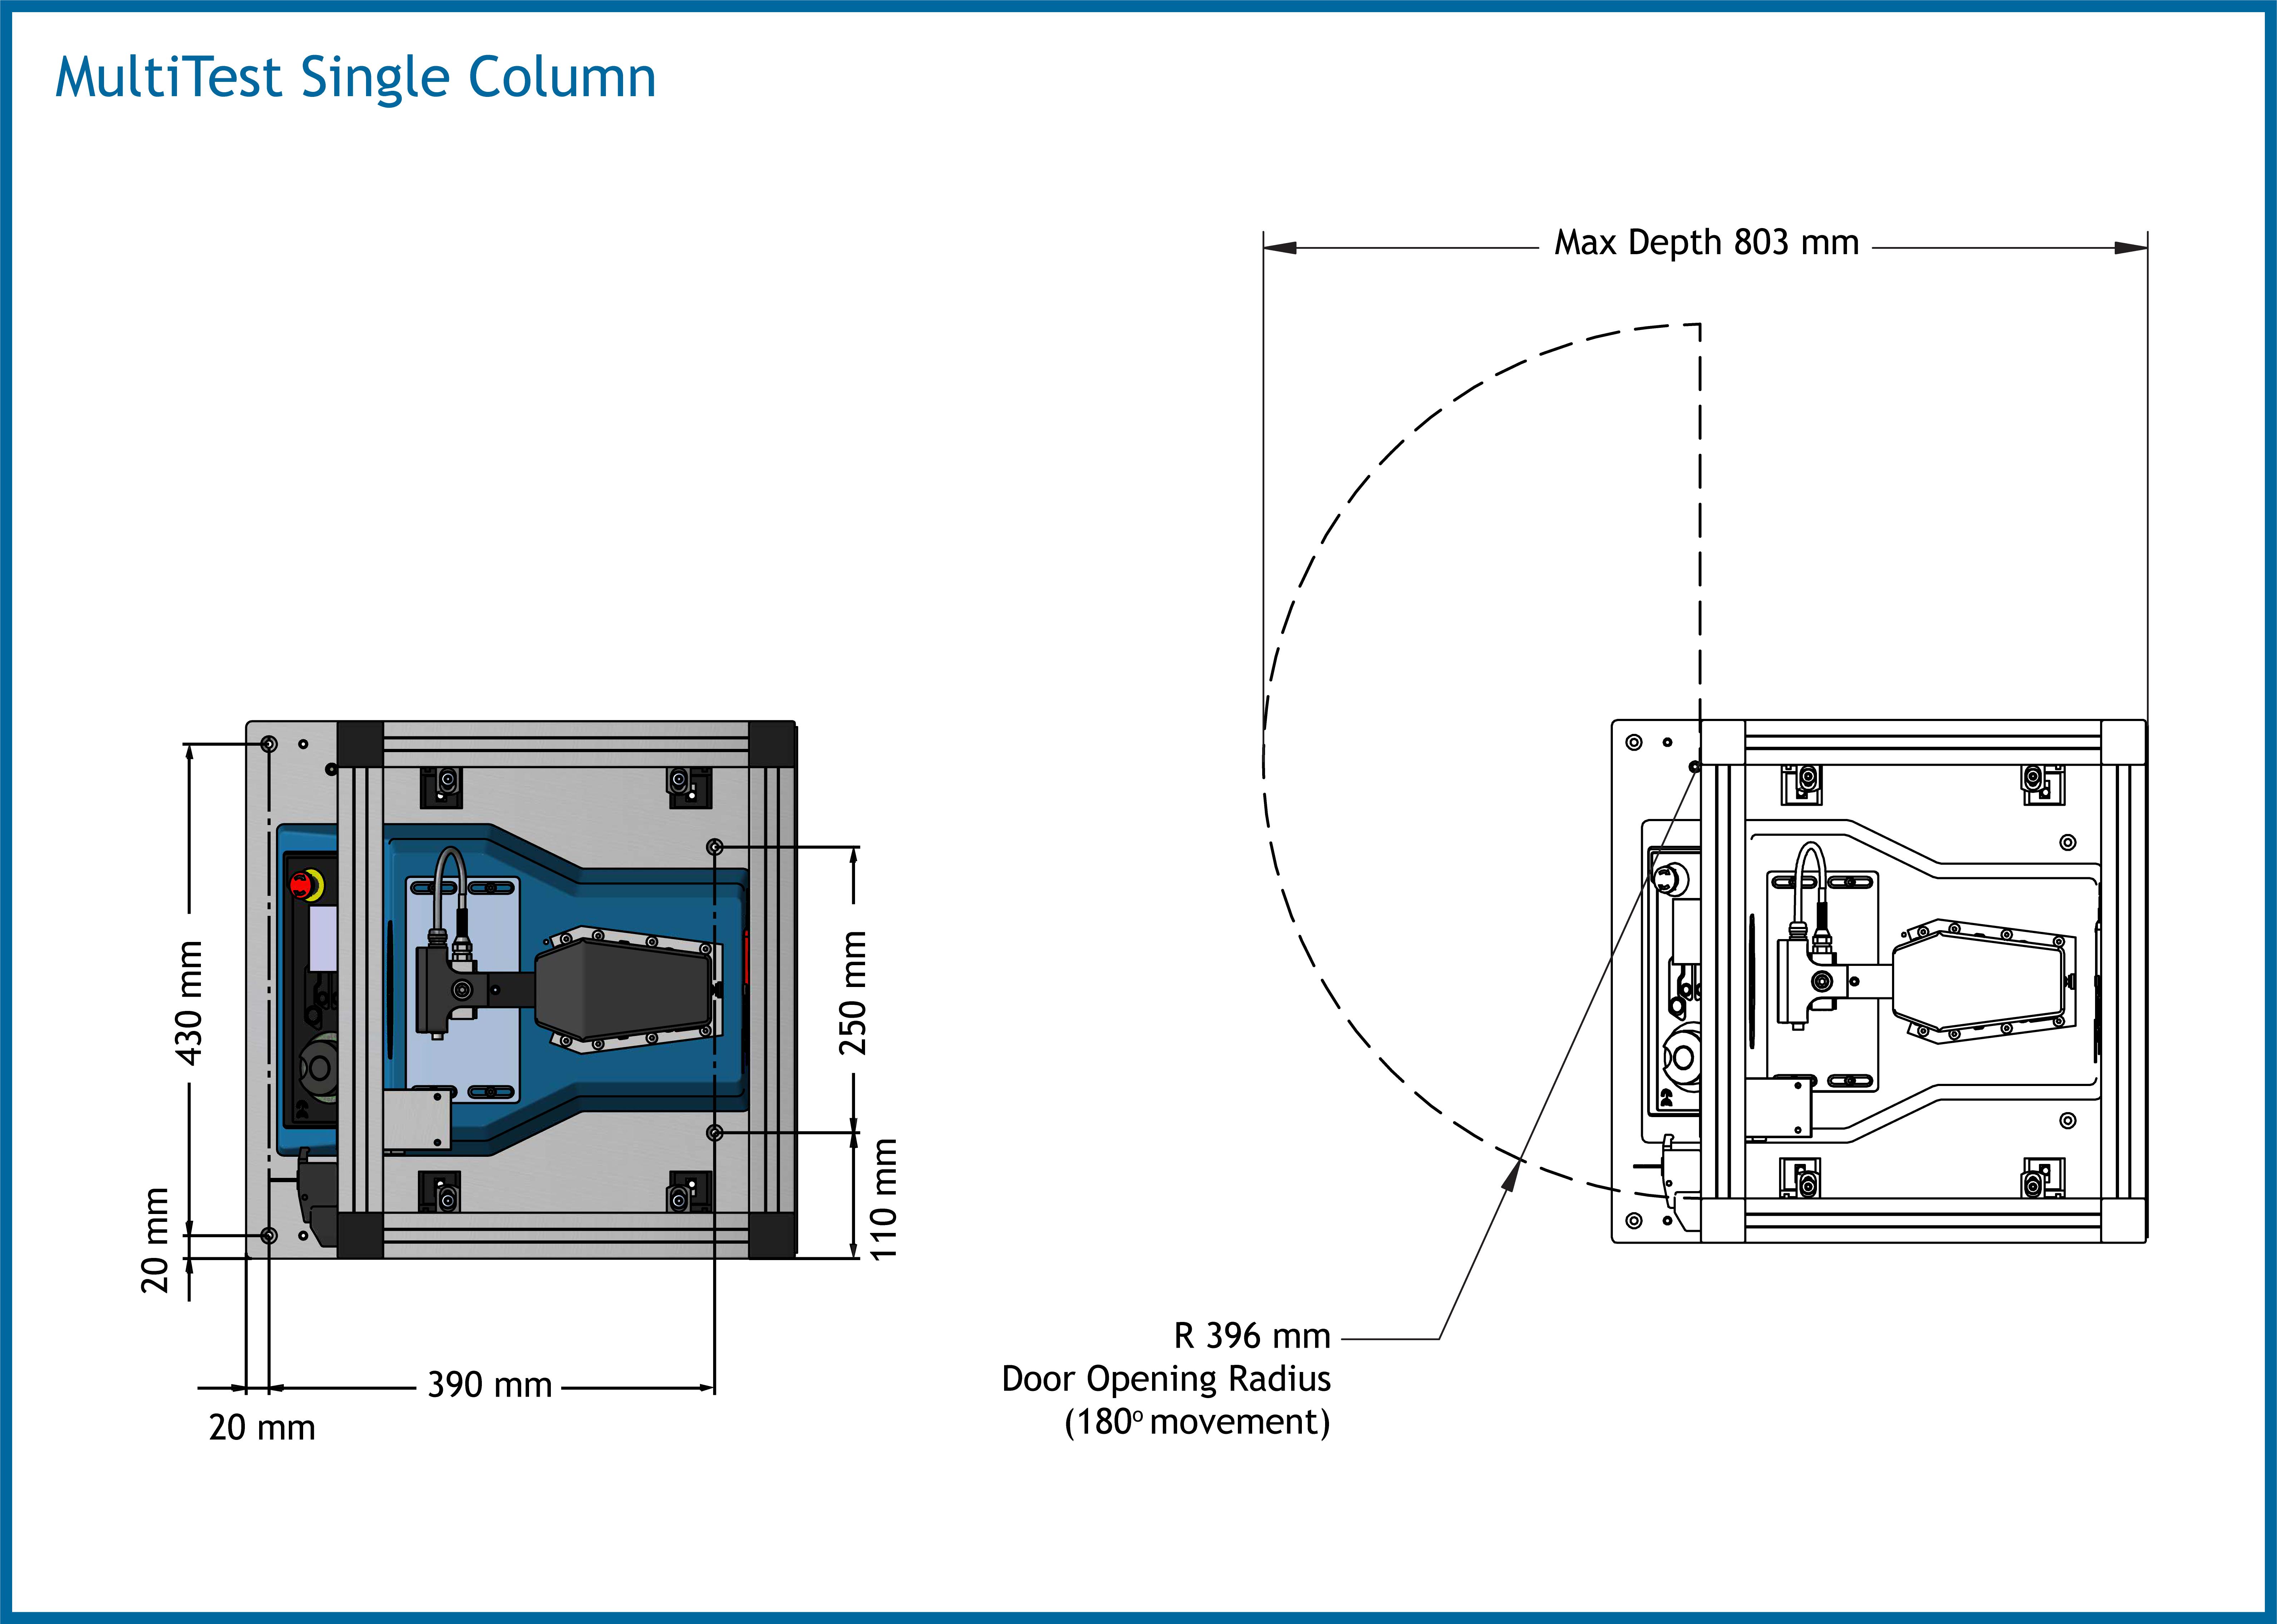 MultiTest Single Column Dimensions